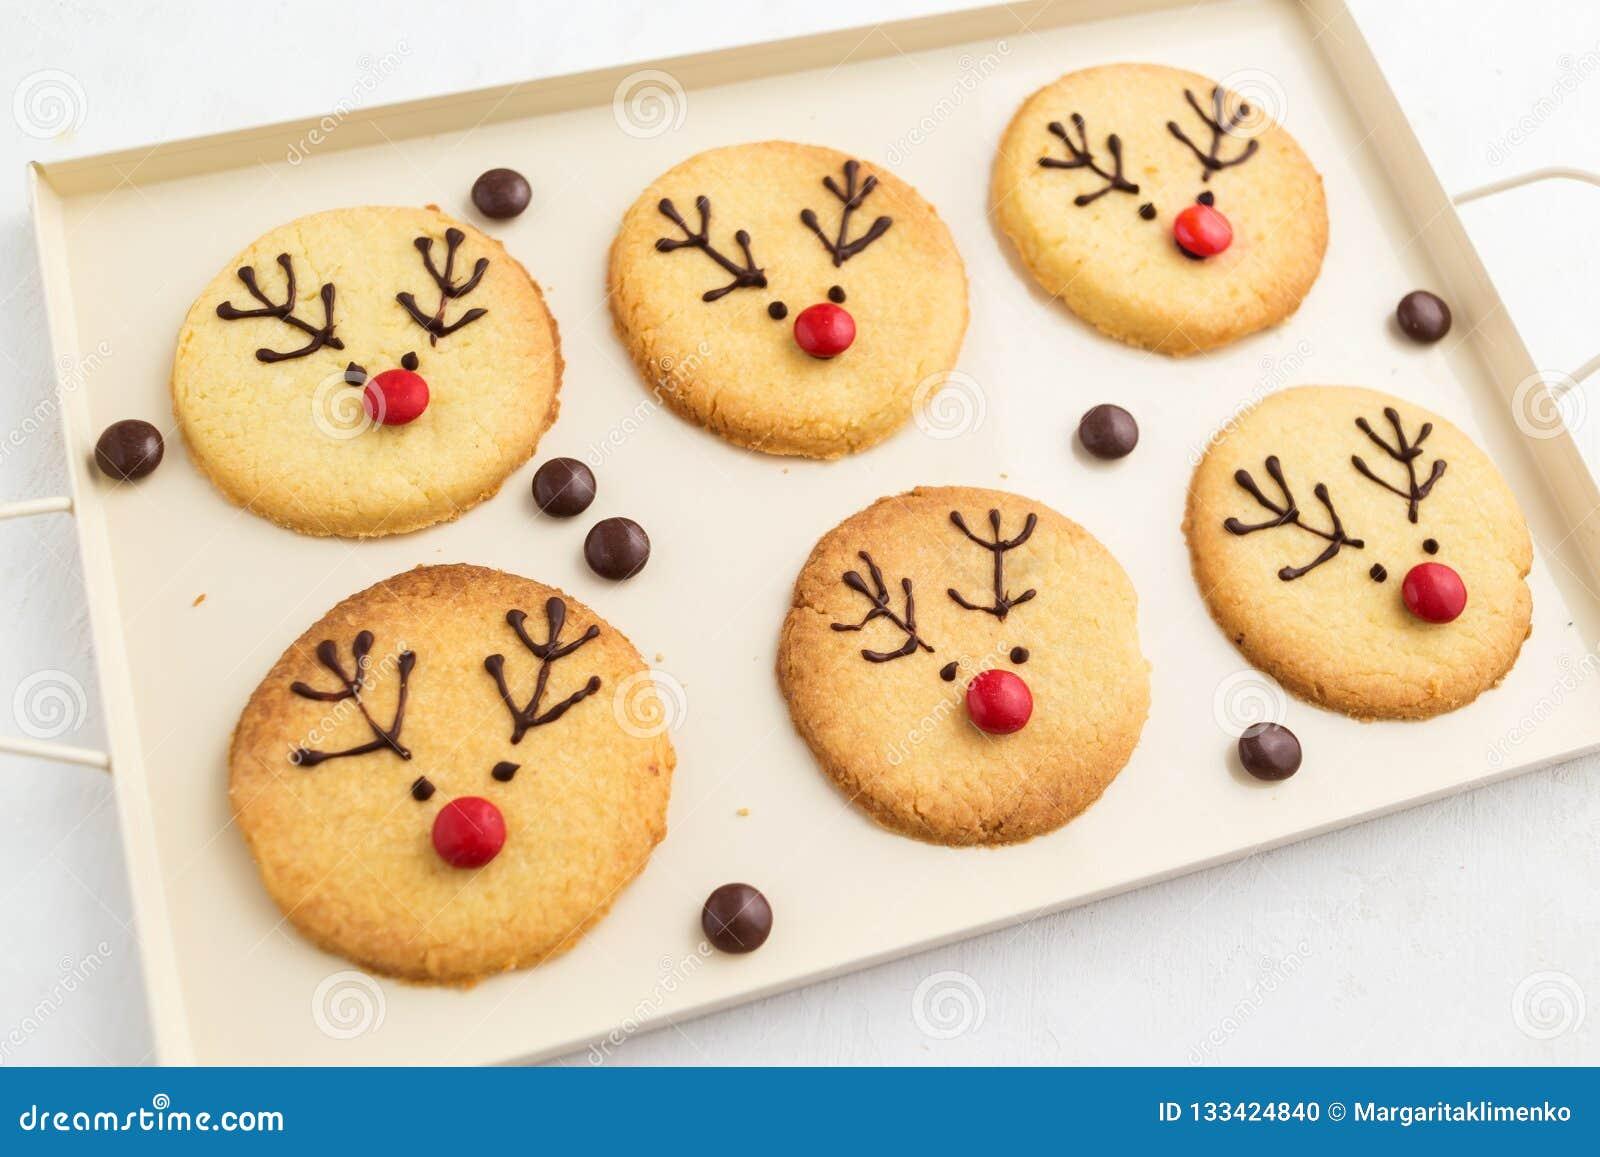 Homemade Reindeer Cookies Stock Photo Image Of Holiday 133424840